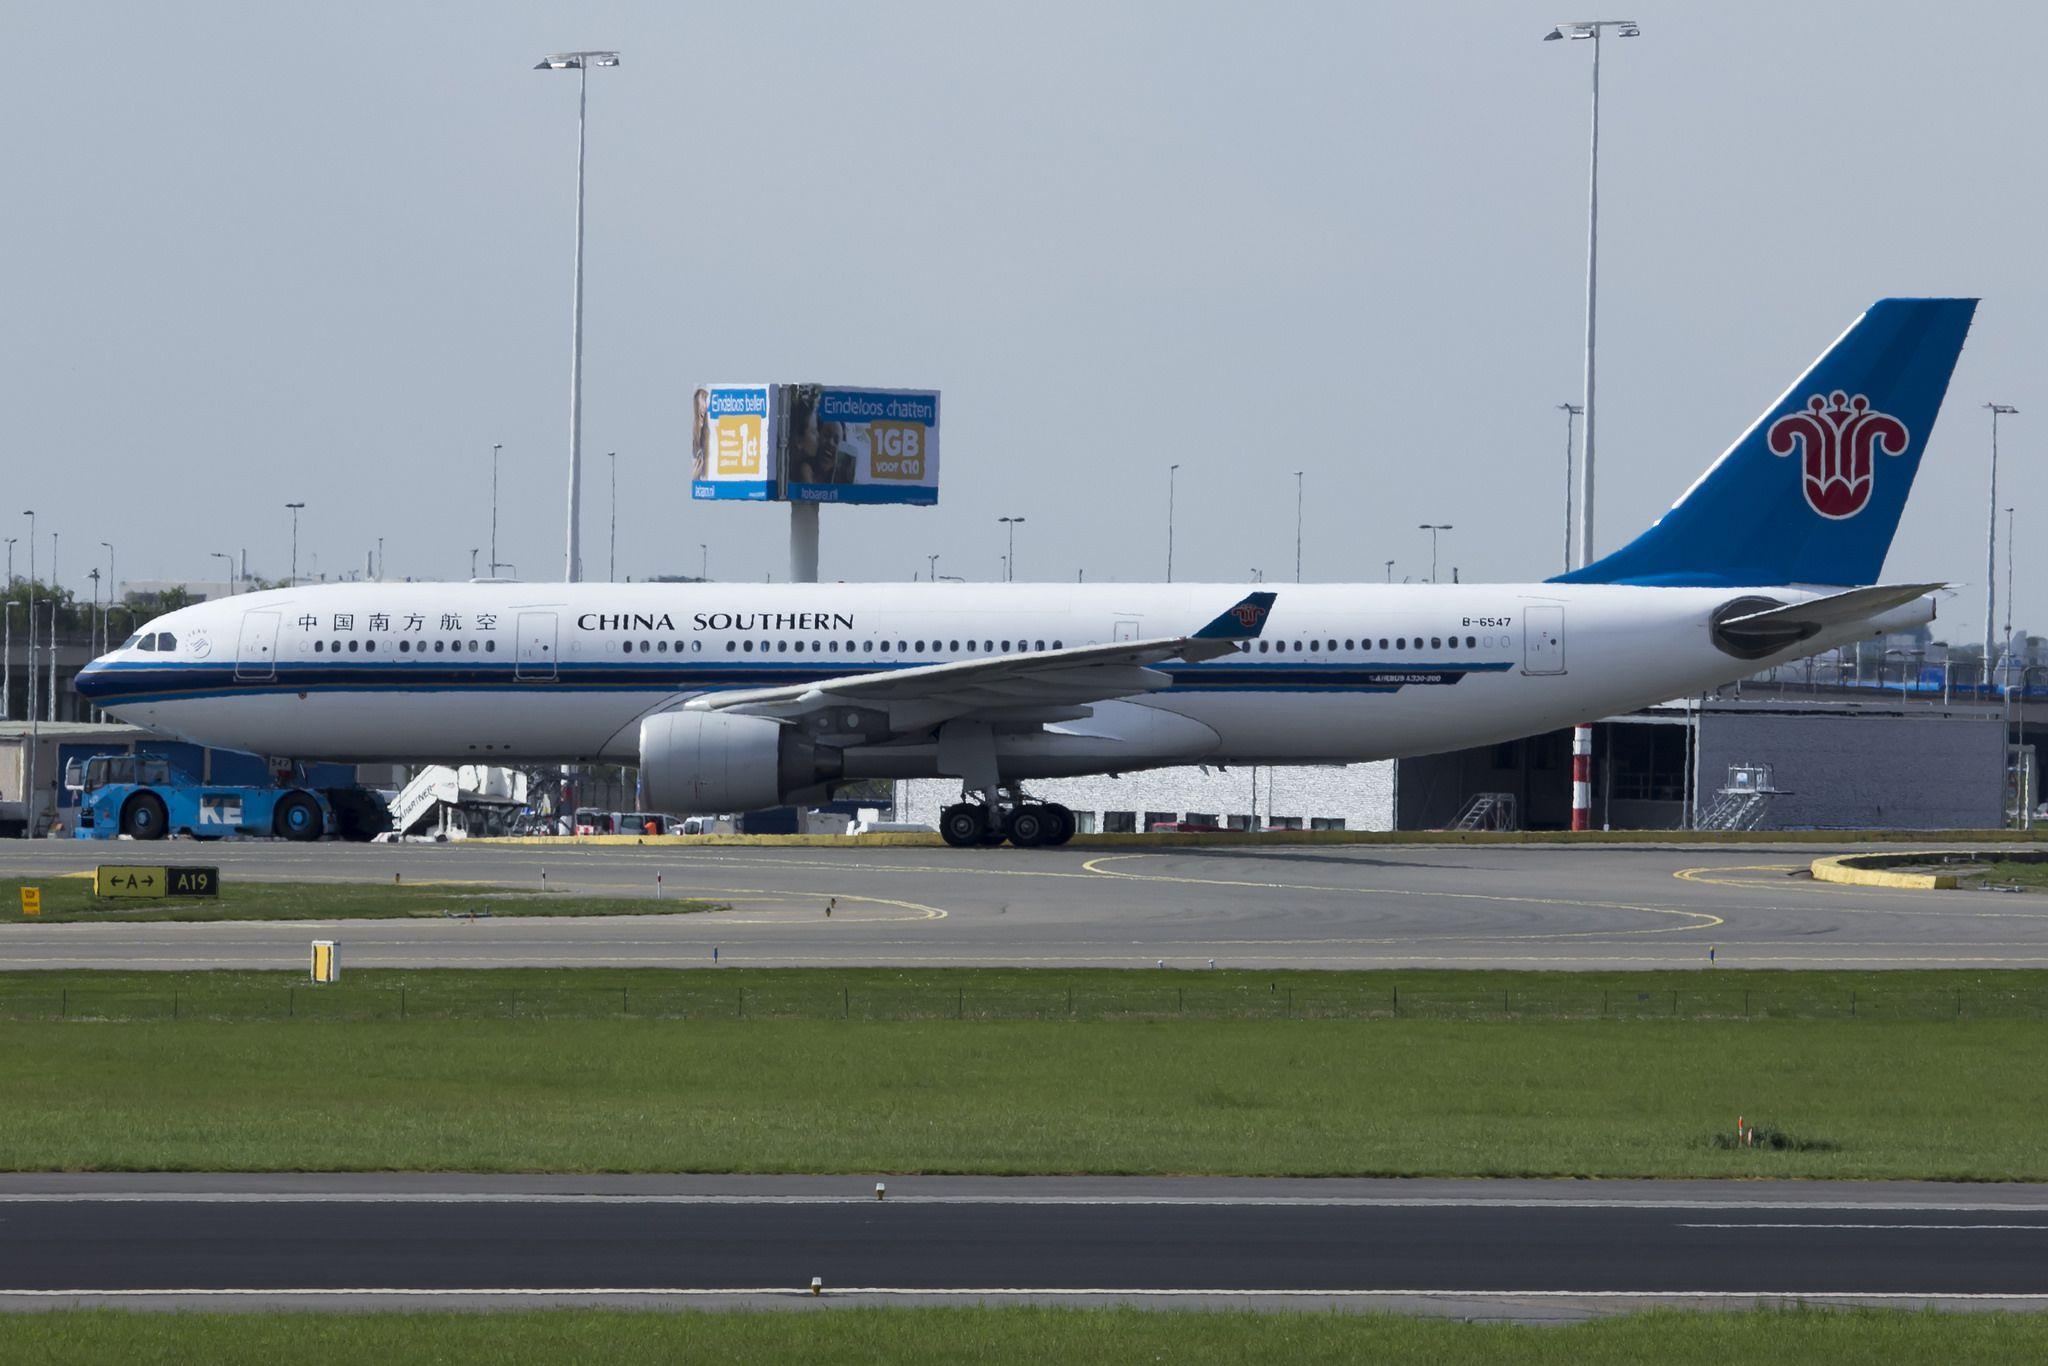 China Southern Airlines A330223 B6547 China southern